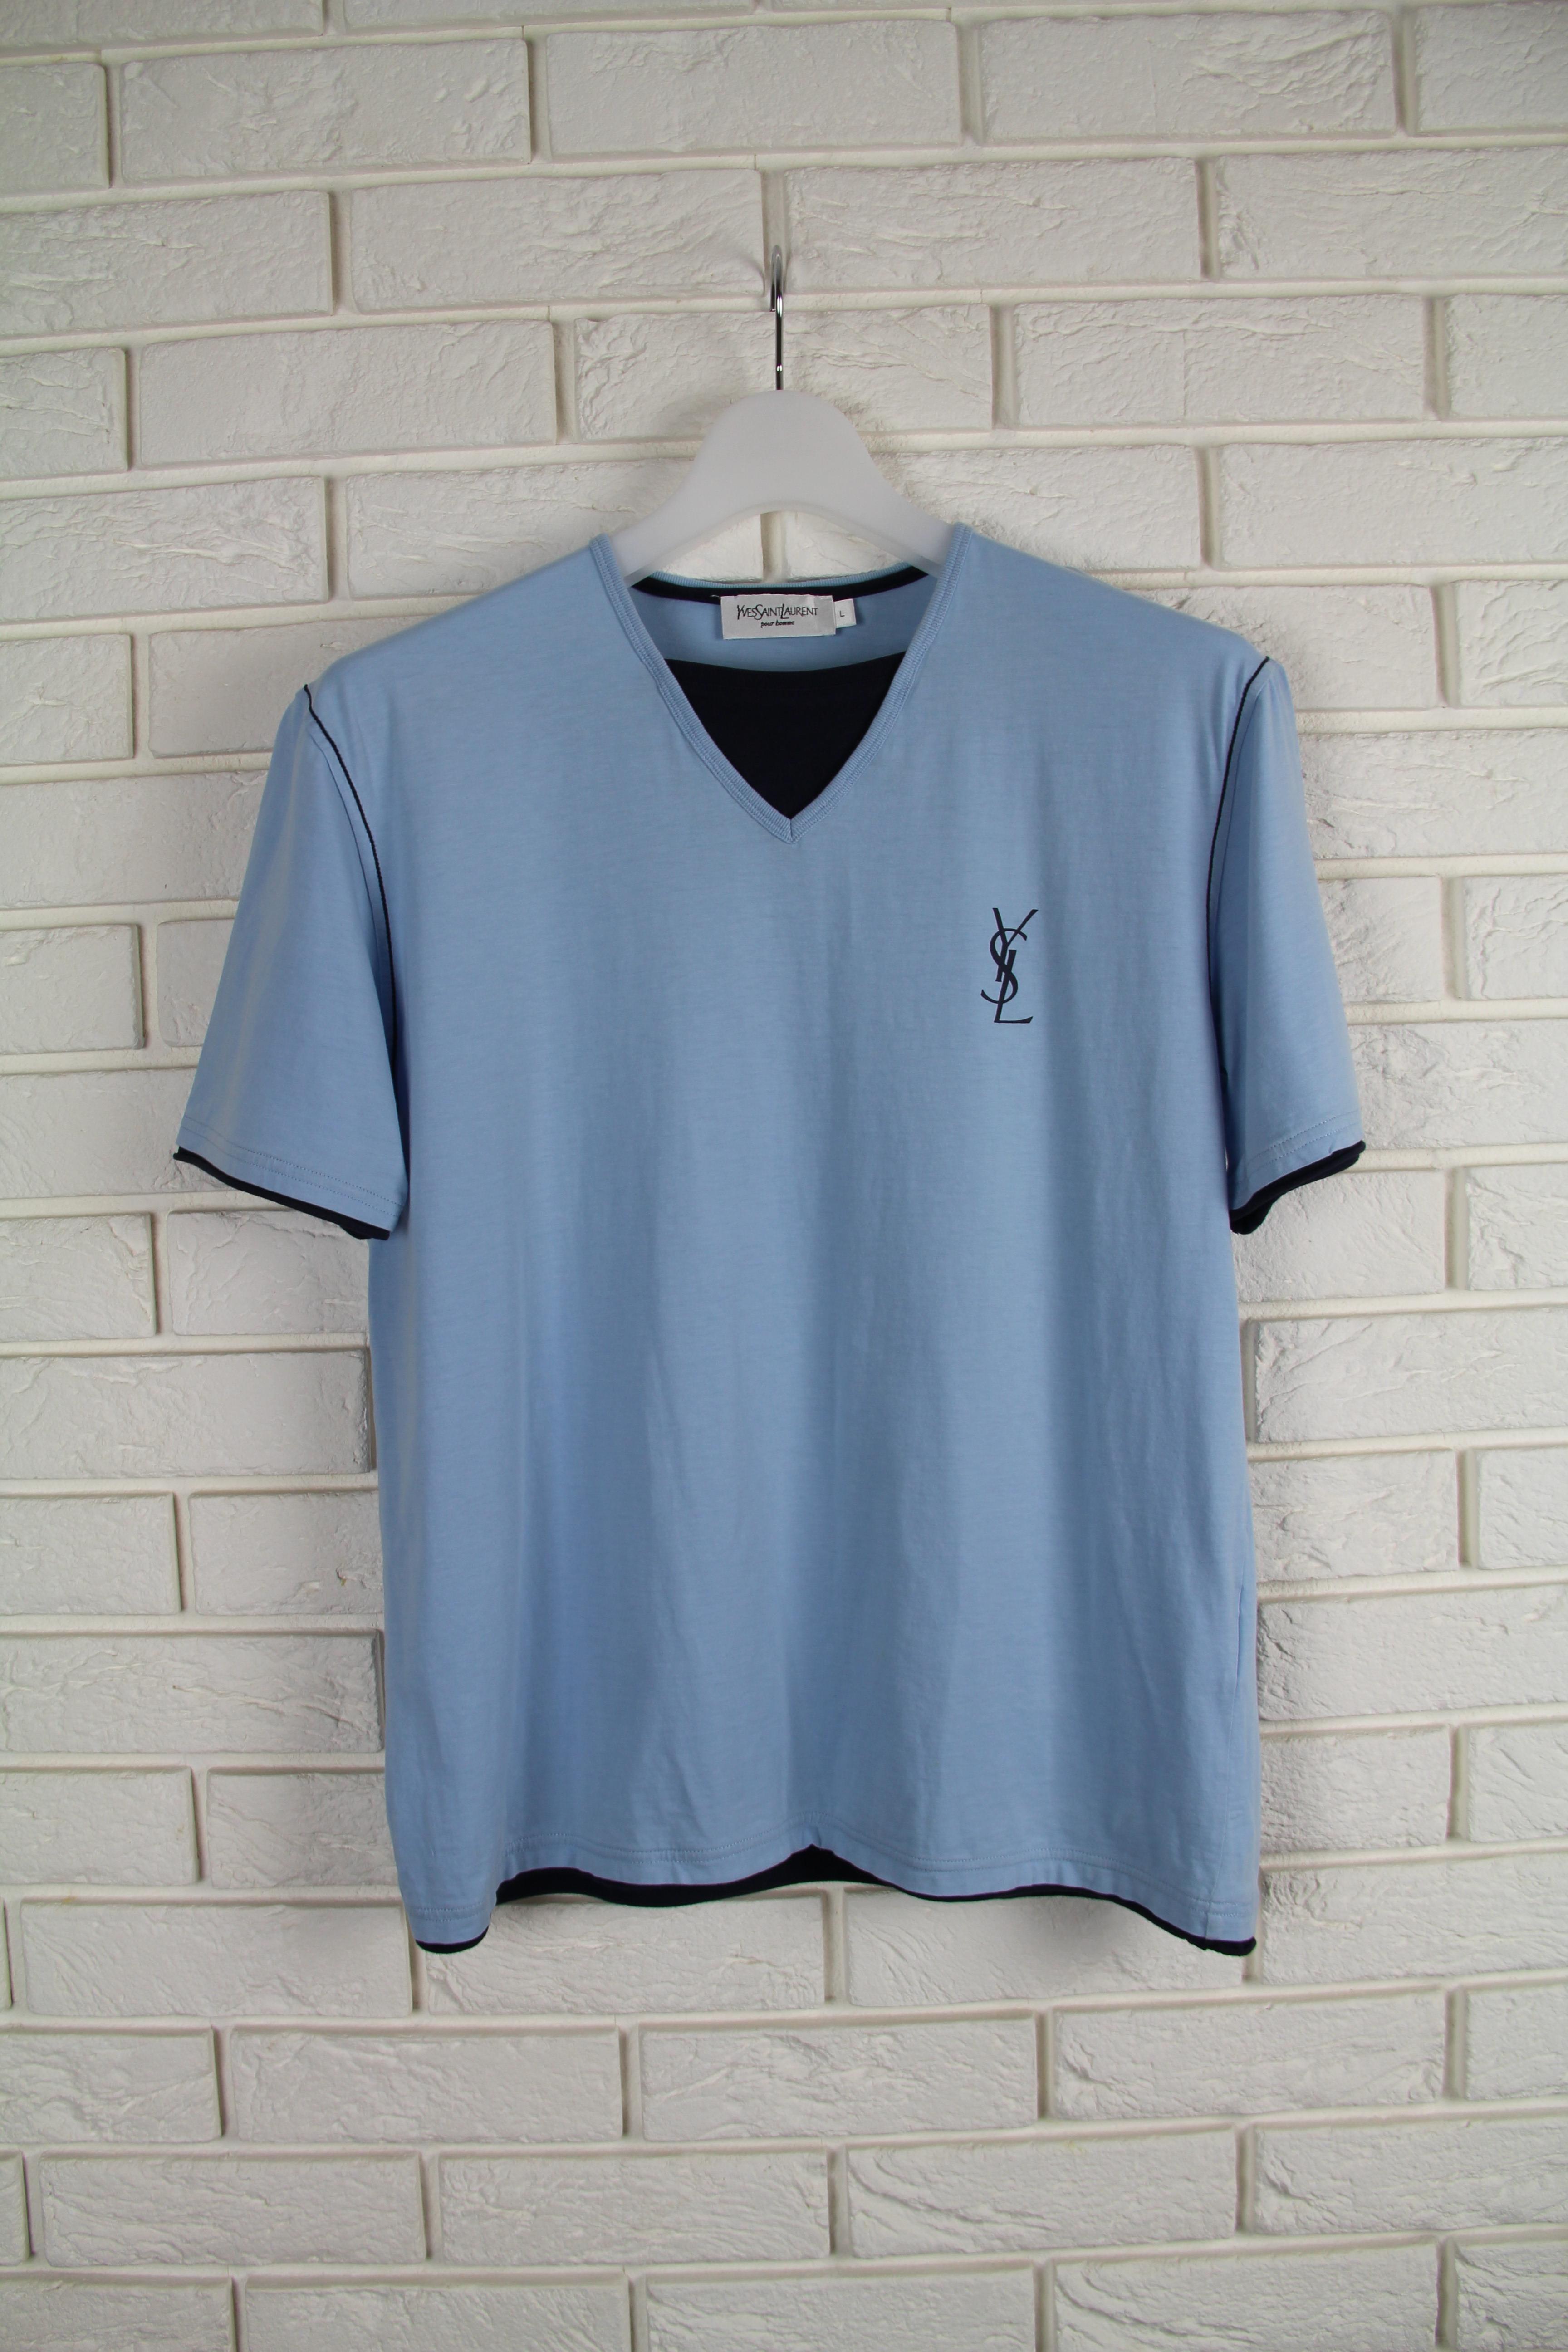 771f71ca98b9 Yves Saint Laurent Ysl Logo T-shirt